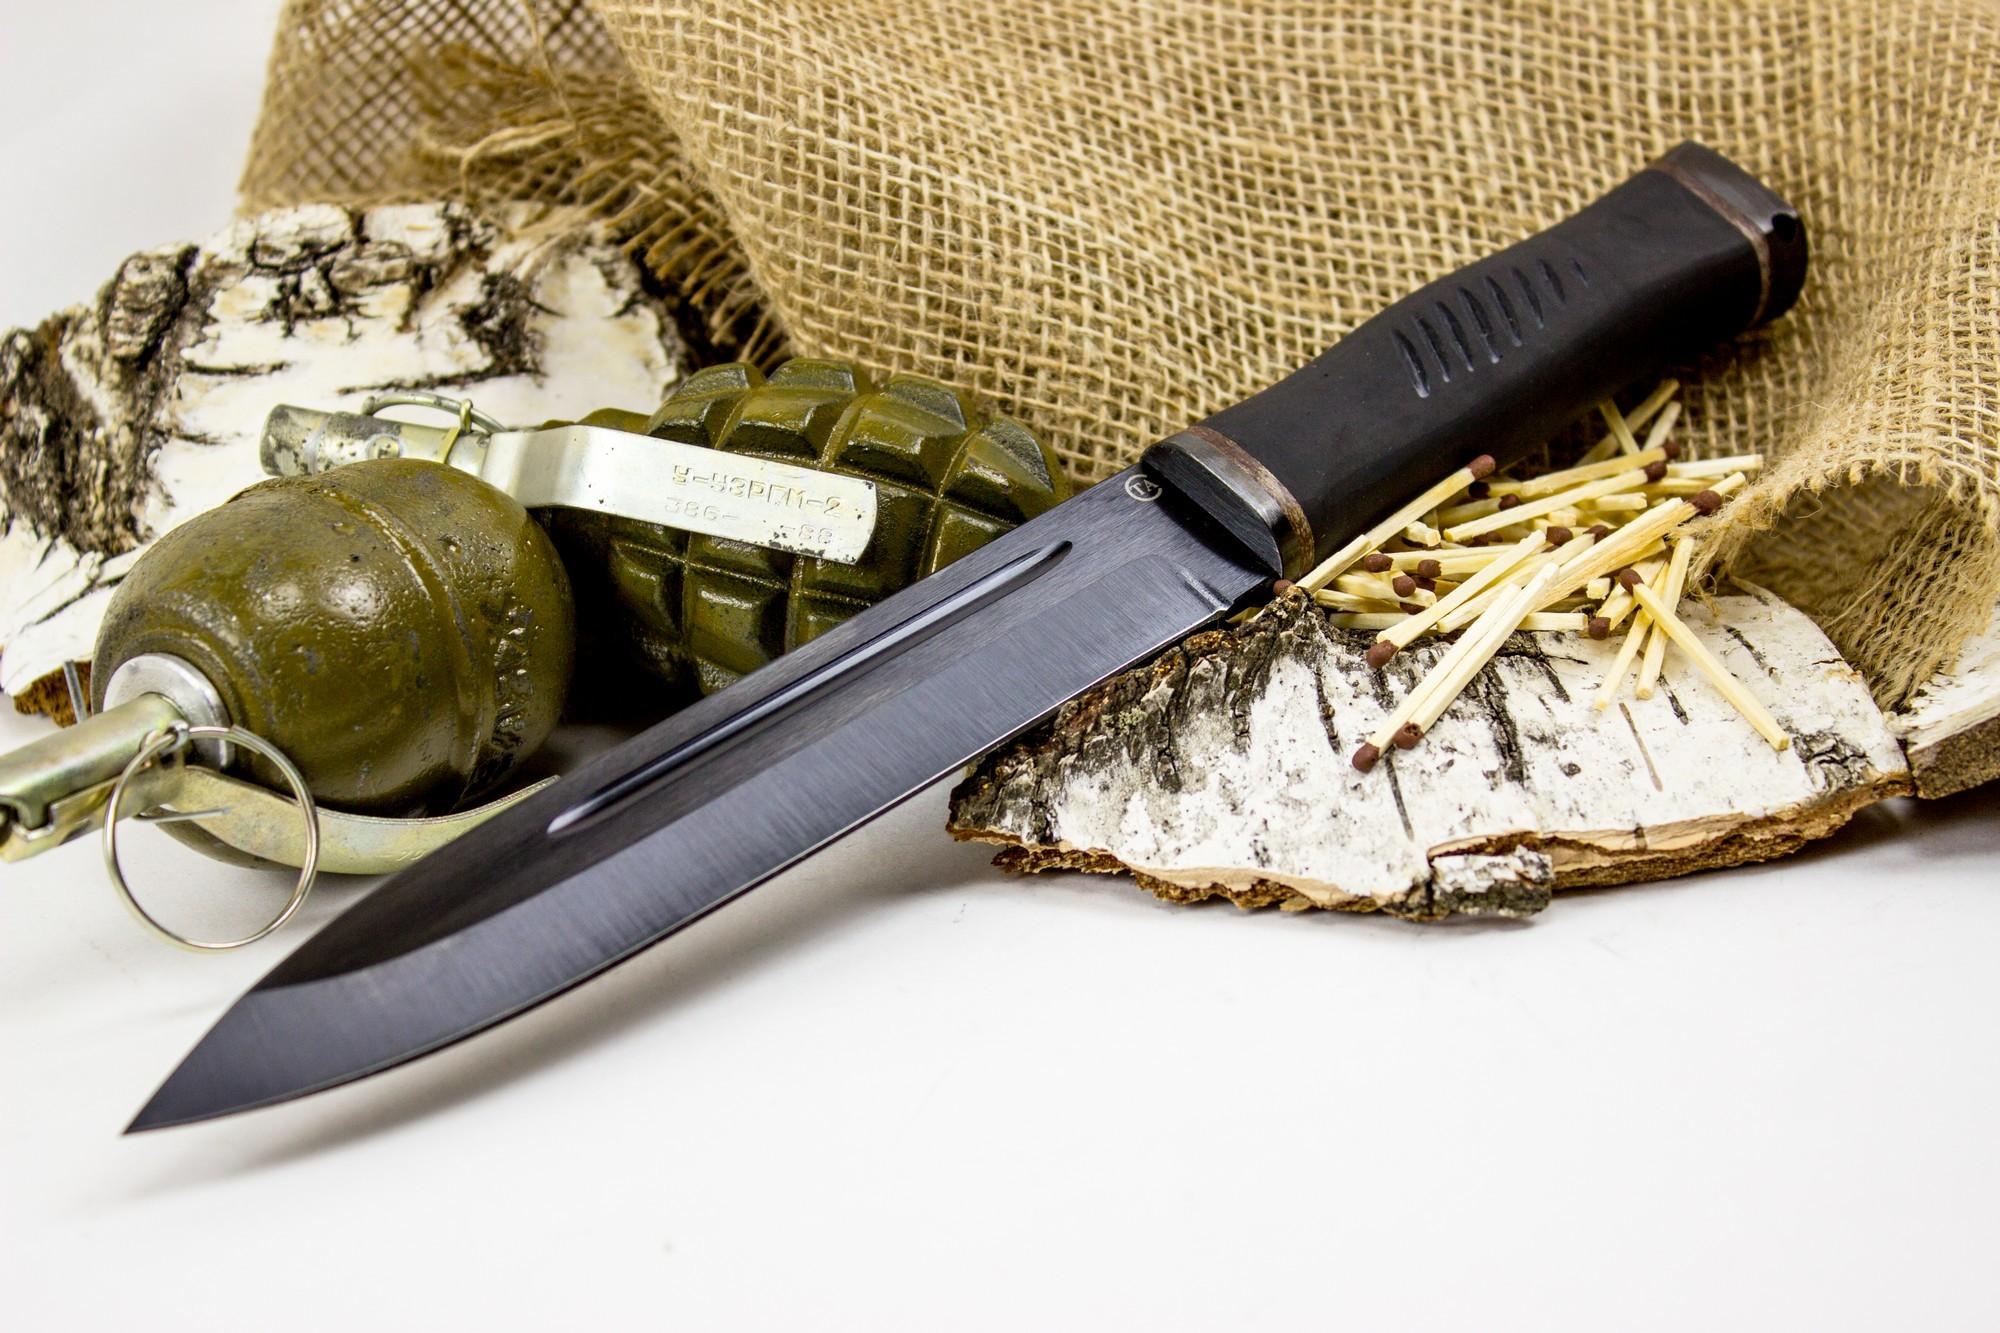 Фото 6 - Нож Горец-2, сталь 65Г, резина от Титов и Солдатова